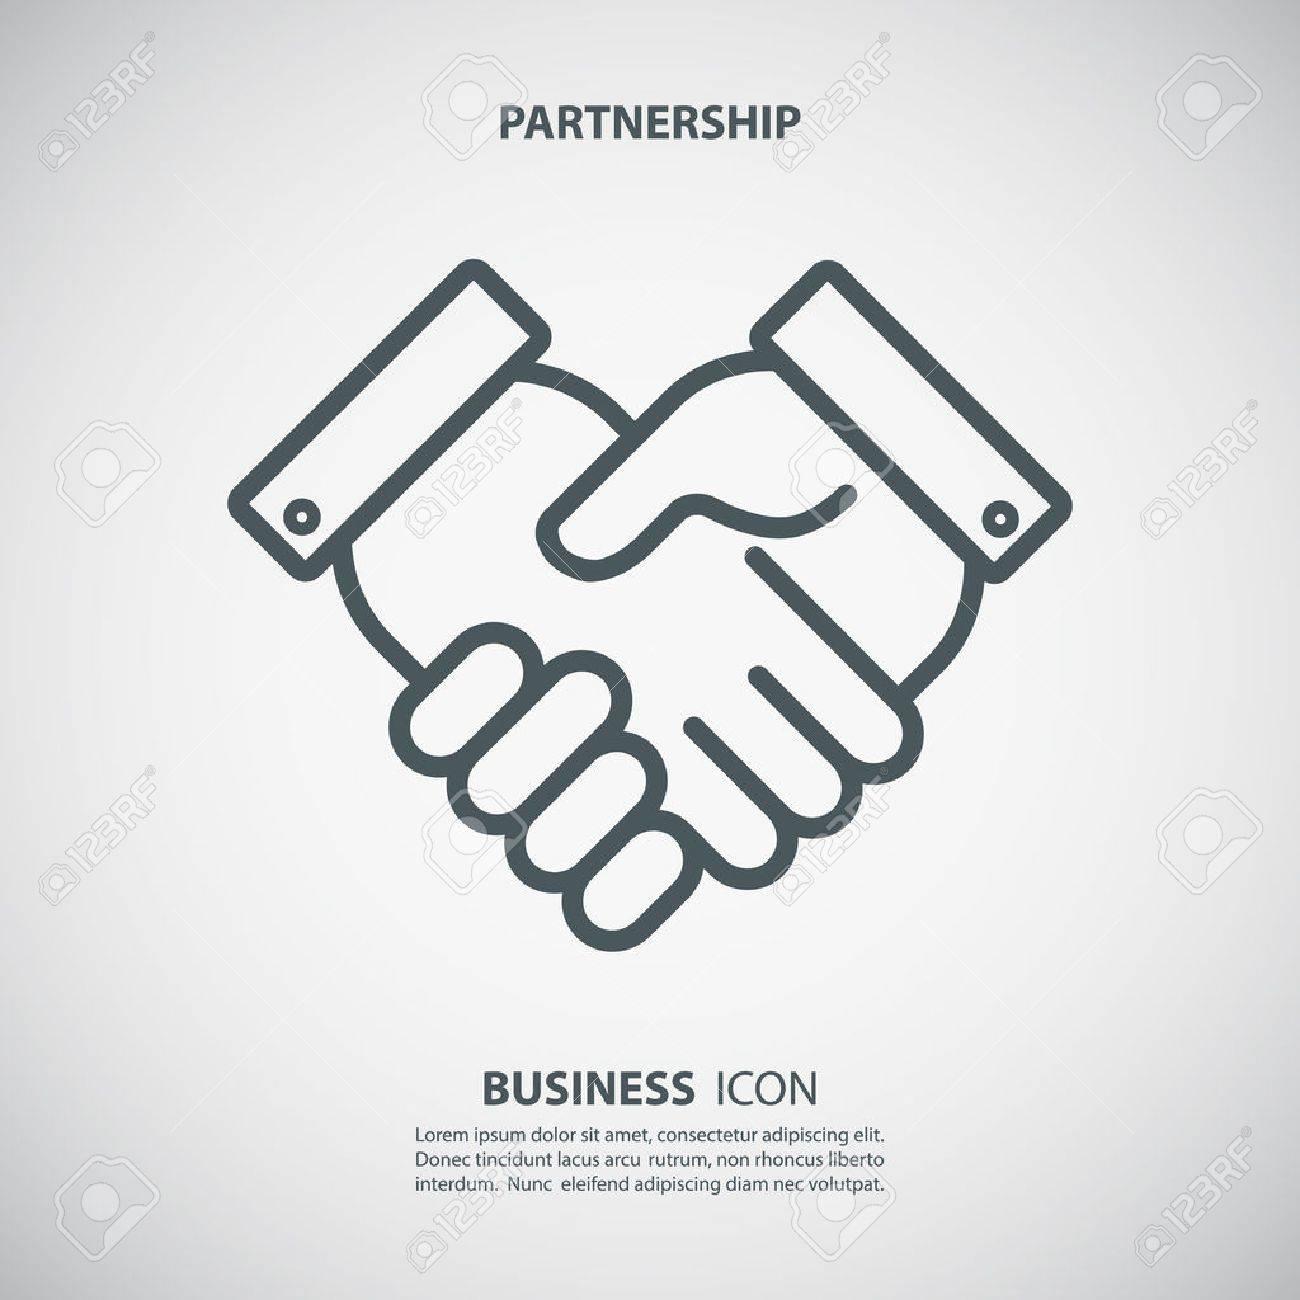 Partnership icon. Handshake icon. Teamwork and friendship. Business concept. Flat vector illustration. - 55084783